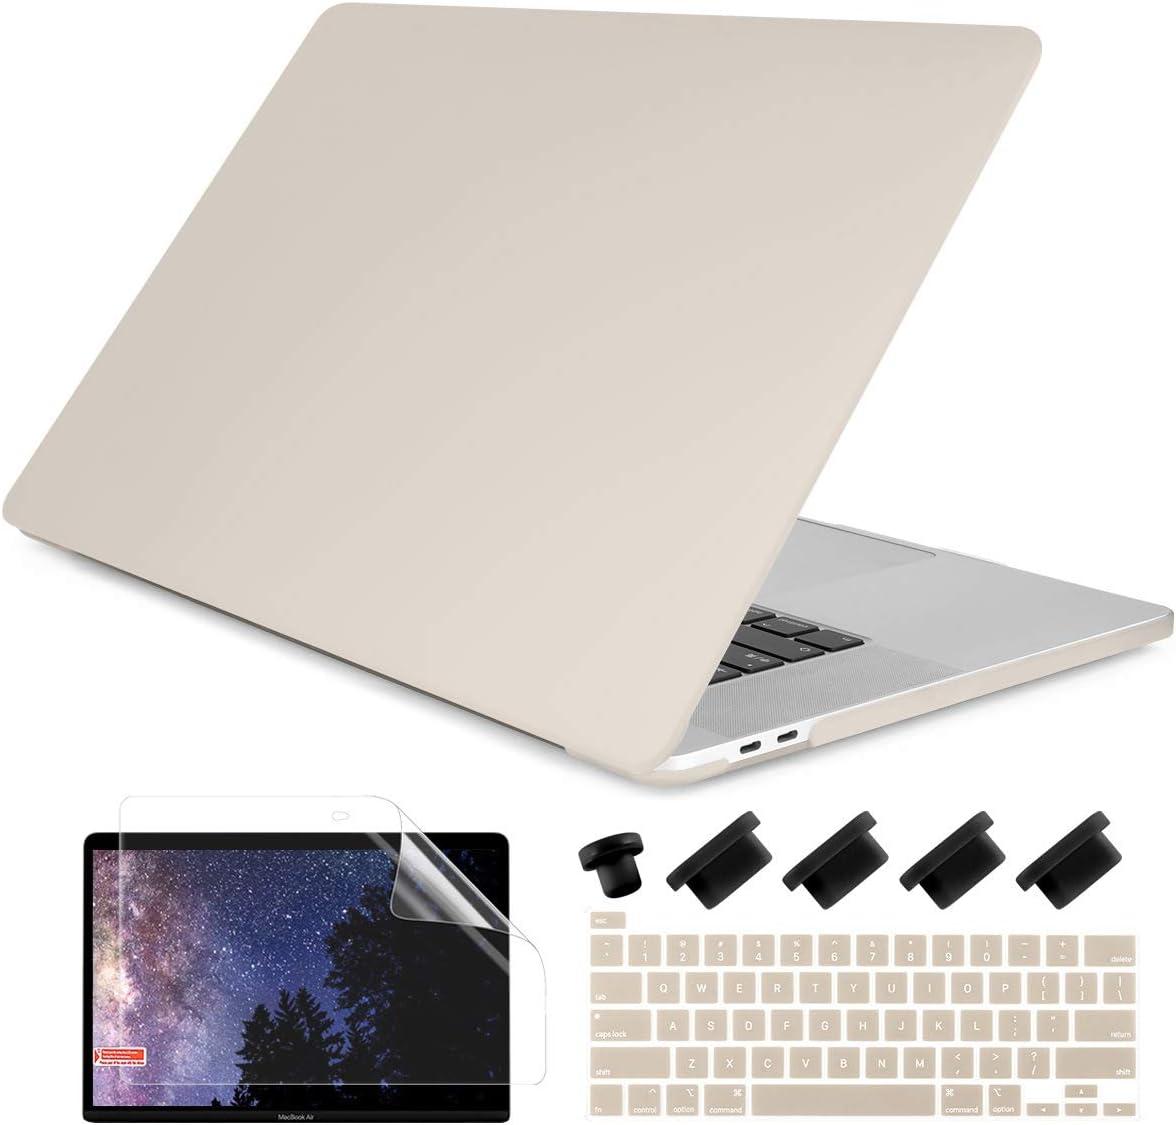 Dongke Popular Virginia Beach Mall standard for MacBook Pro 13 inch Release A2338 M1 Model 2020 Case